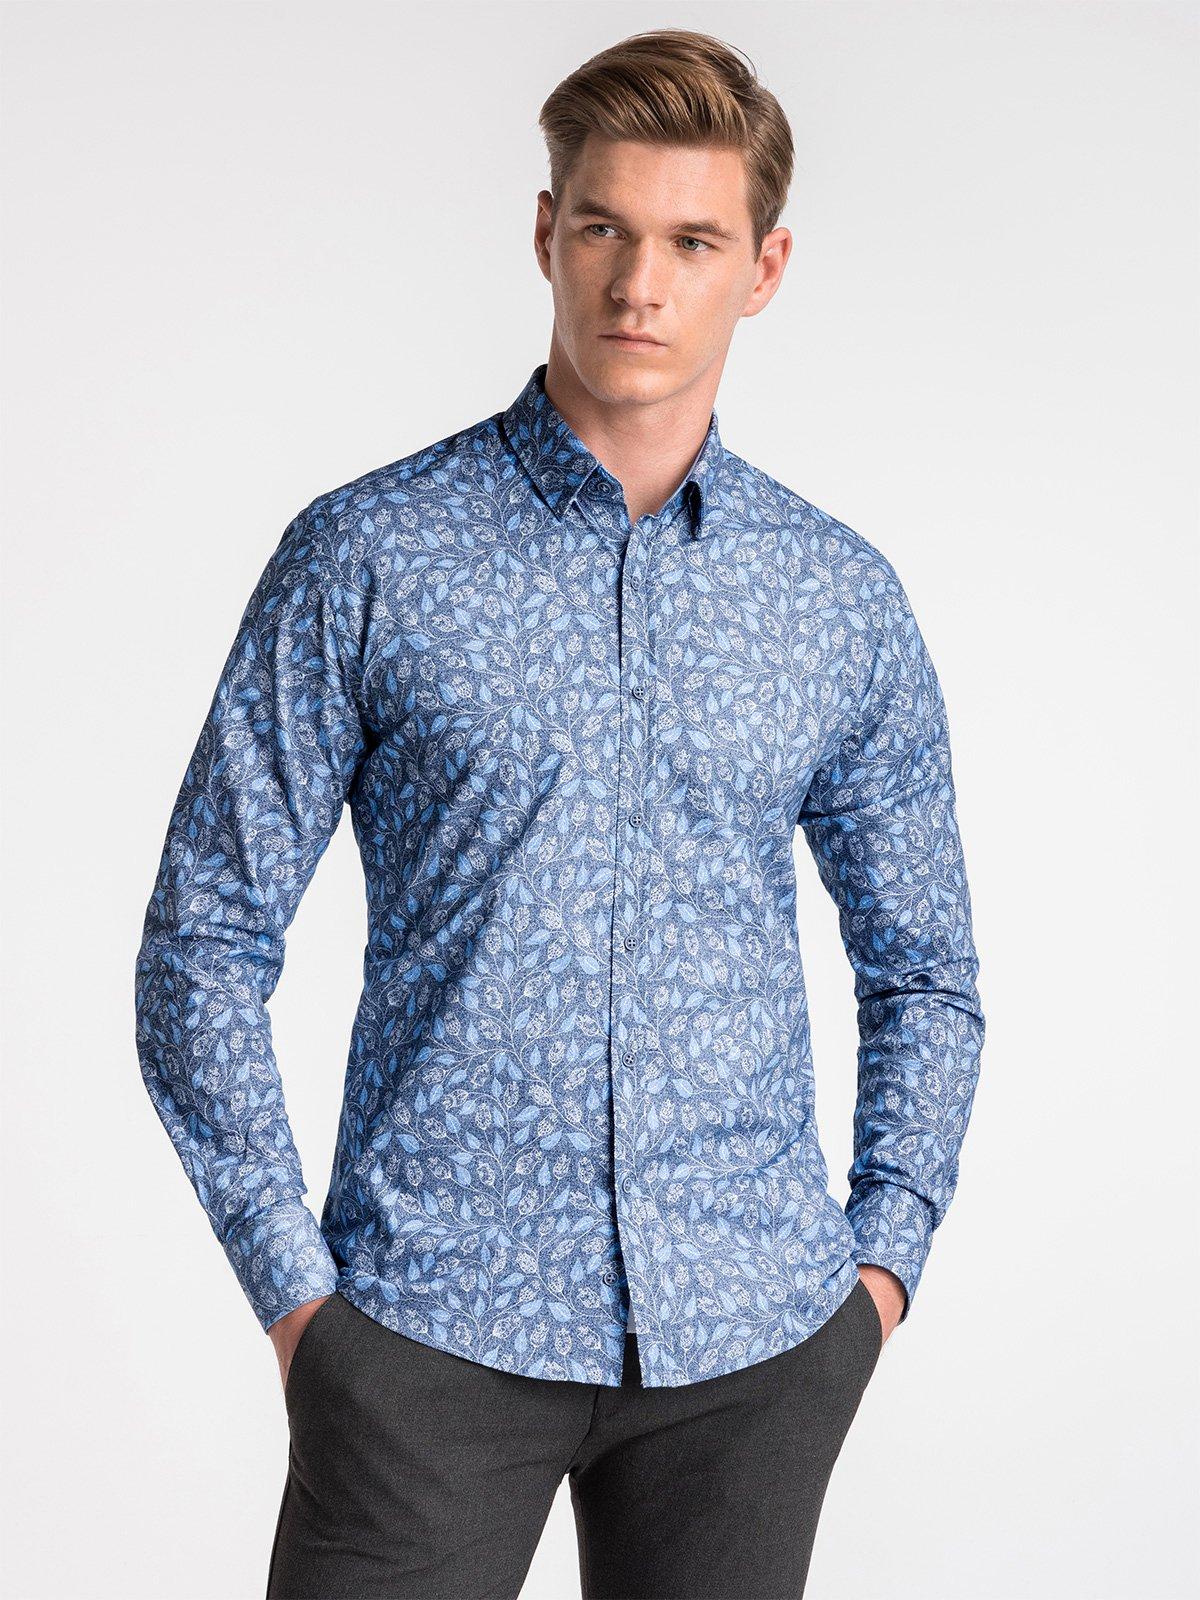 5c2a7bb7389ffc Koszula męska elegancka z długim rękawem K500 - granatowa/niebieska ...